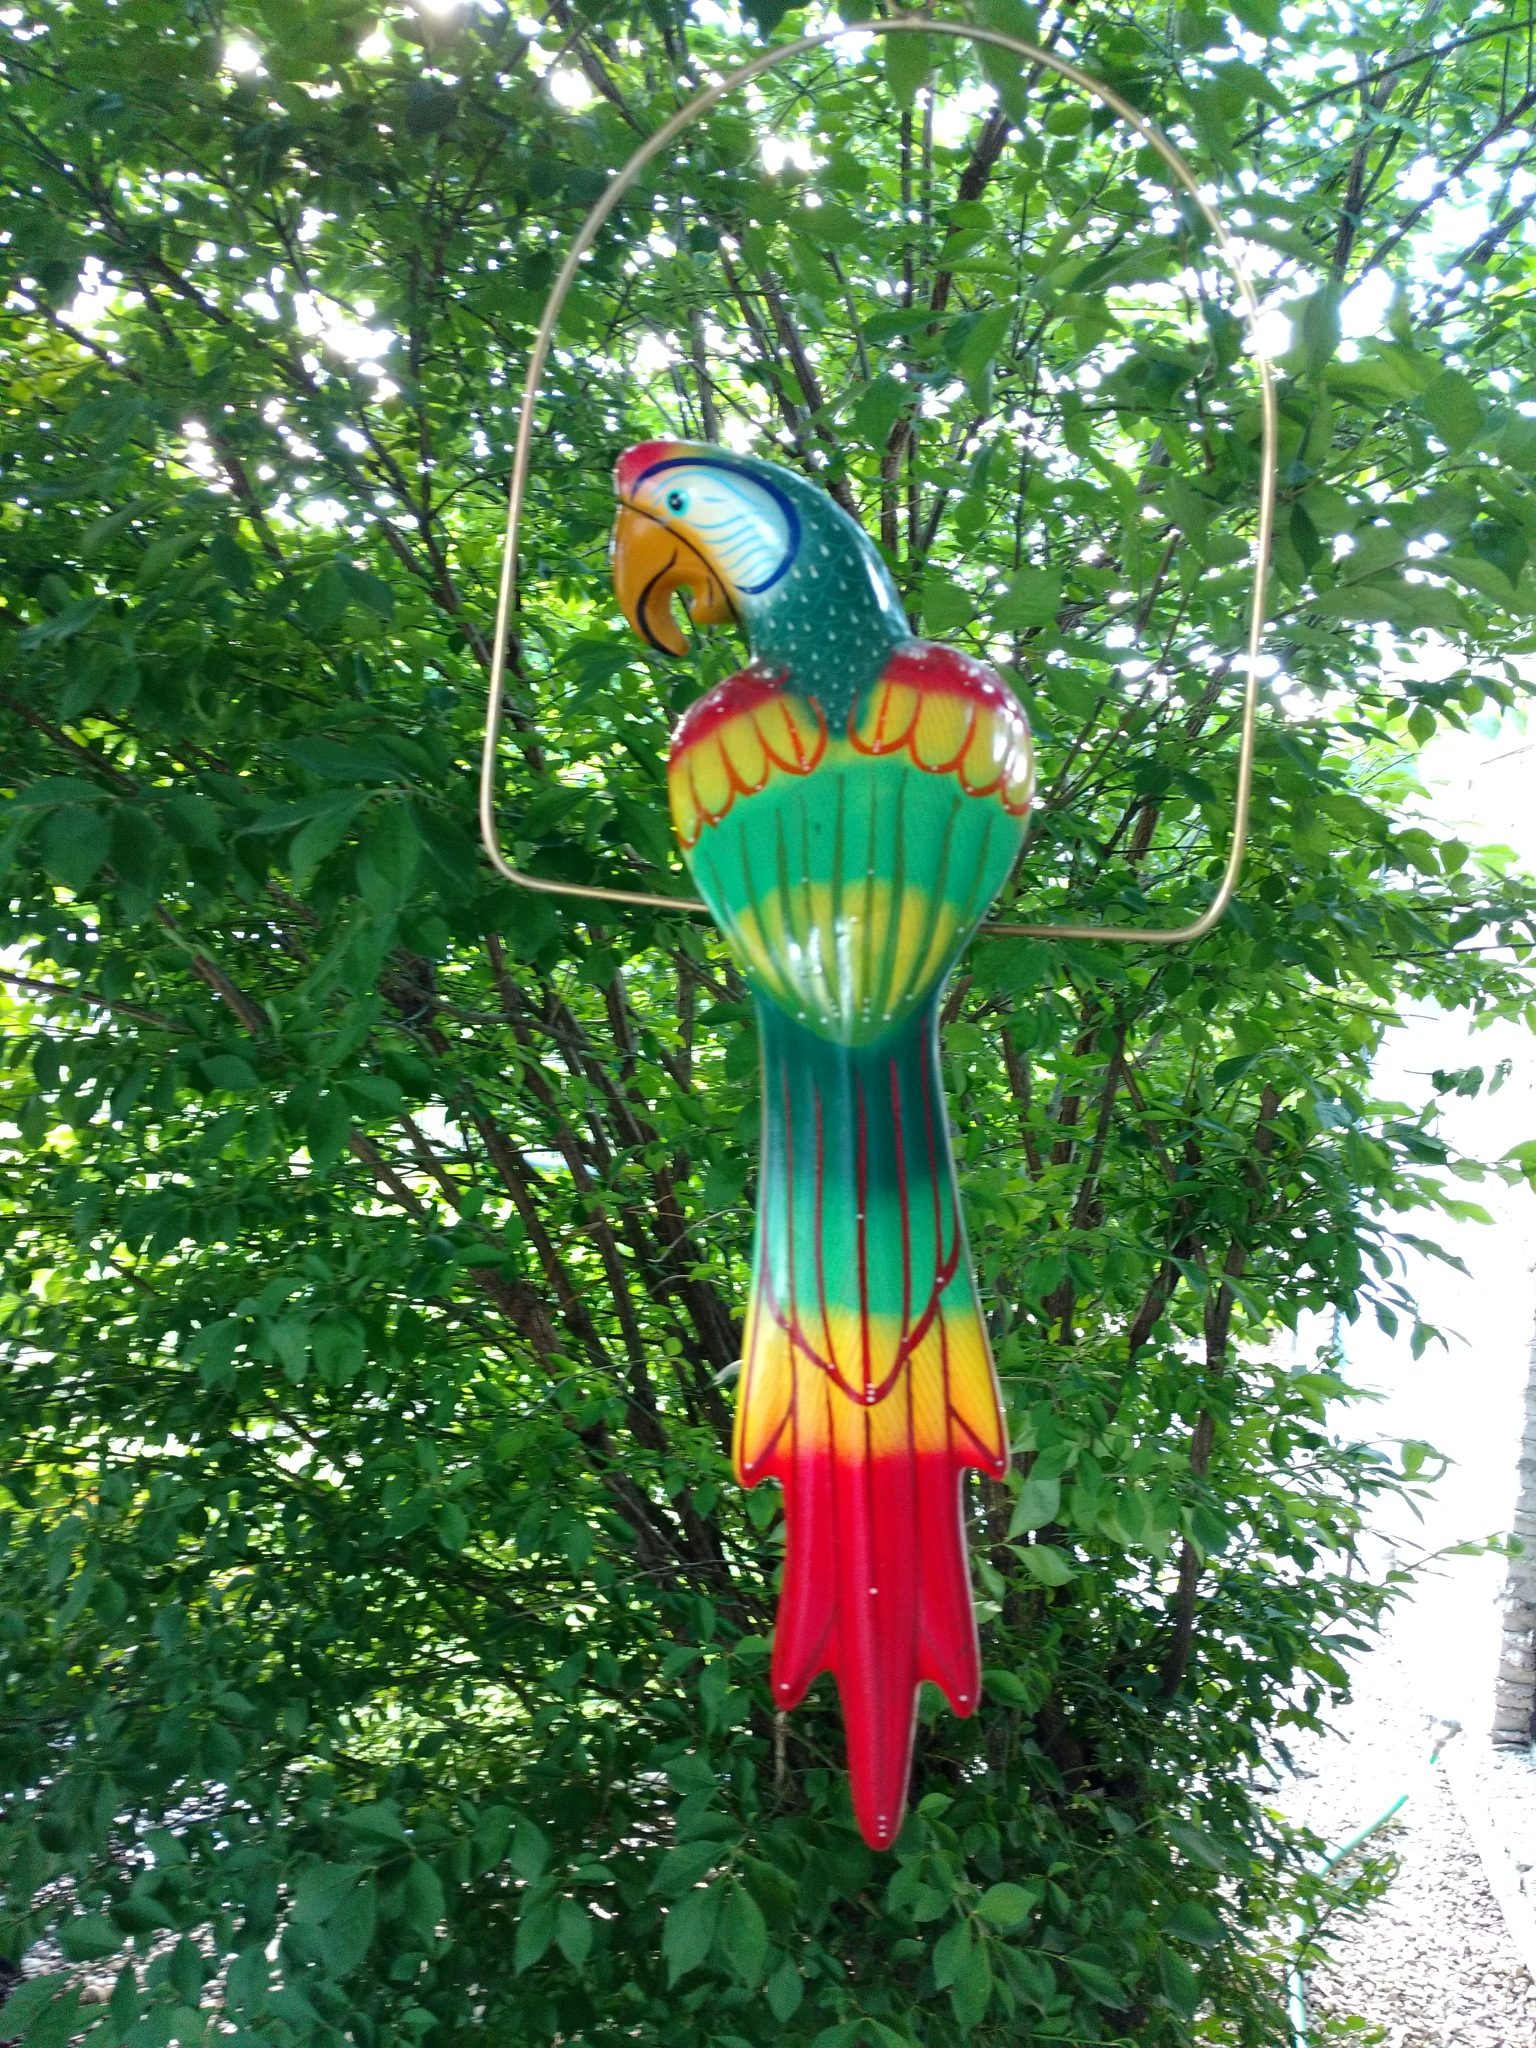 Colorful Parrot by mellingerlj